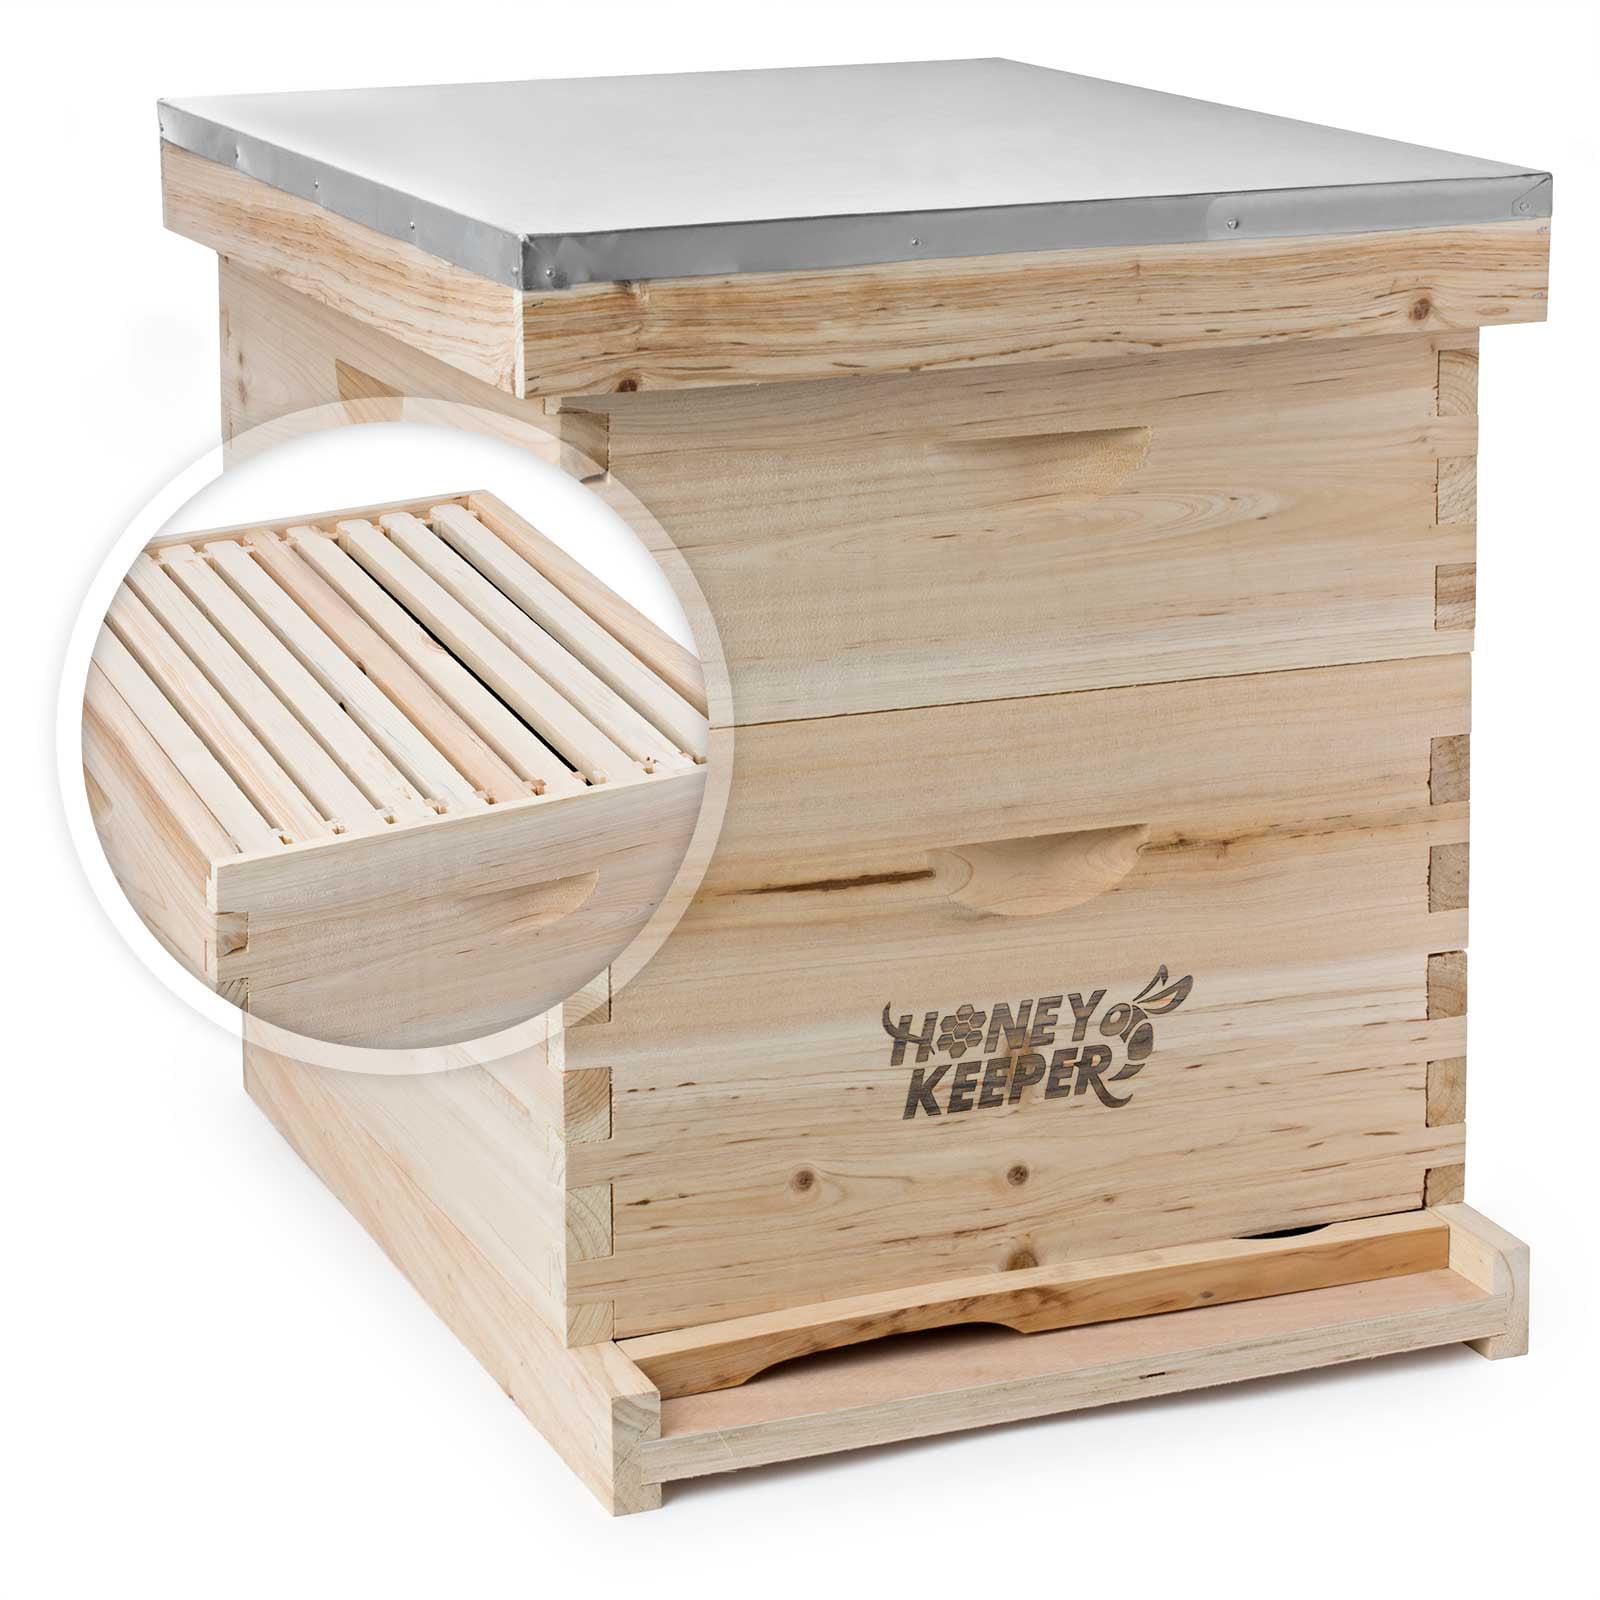 GoodLand Bee Supply GL-2B1SK-ER Beekeeping Double Deep Box Beehive Kit